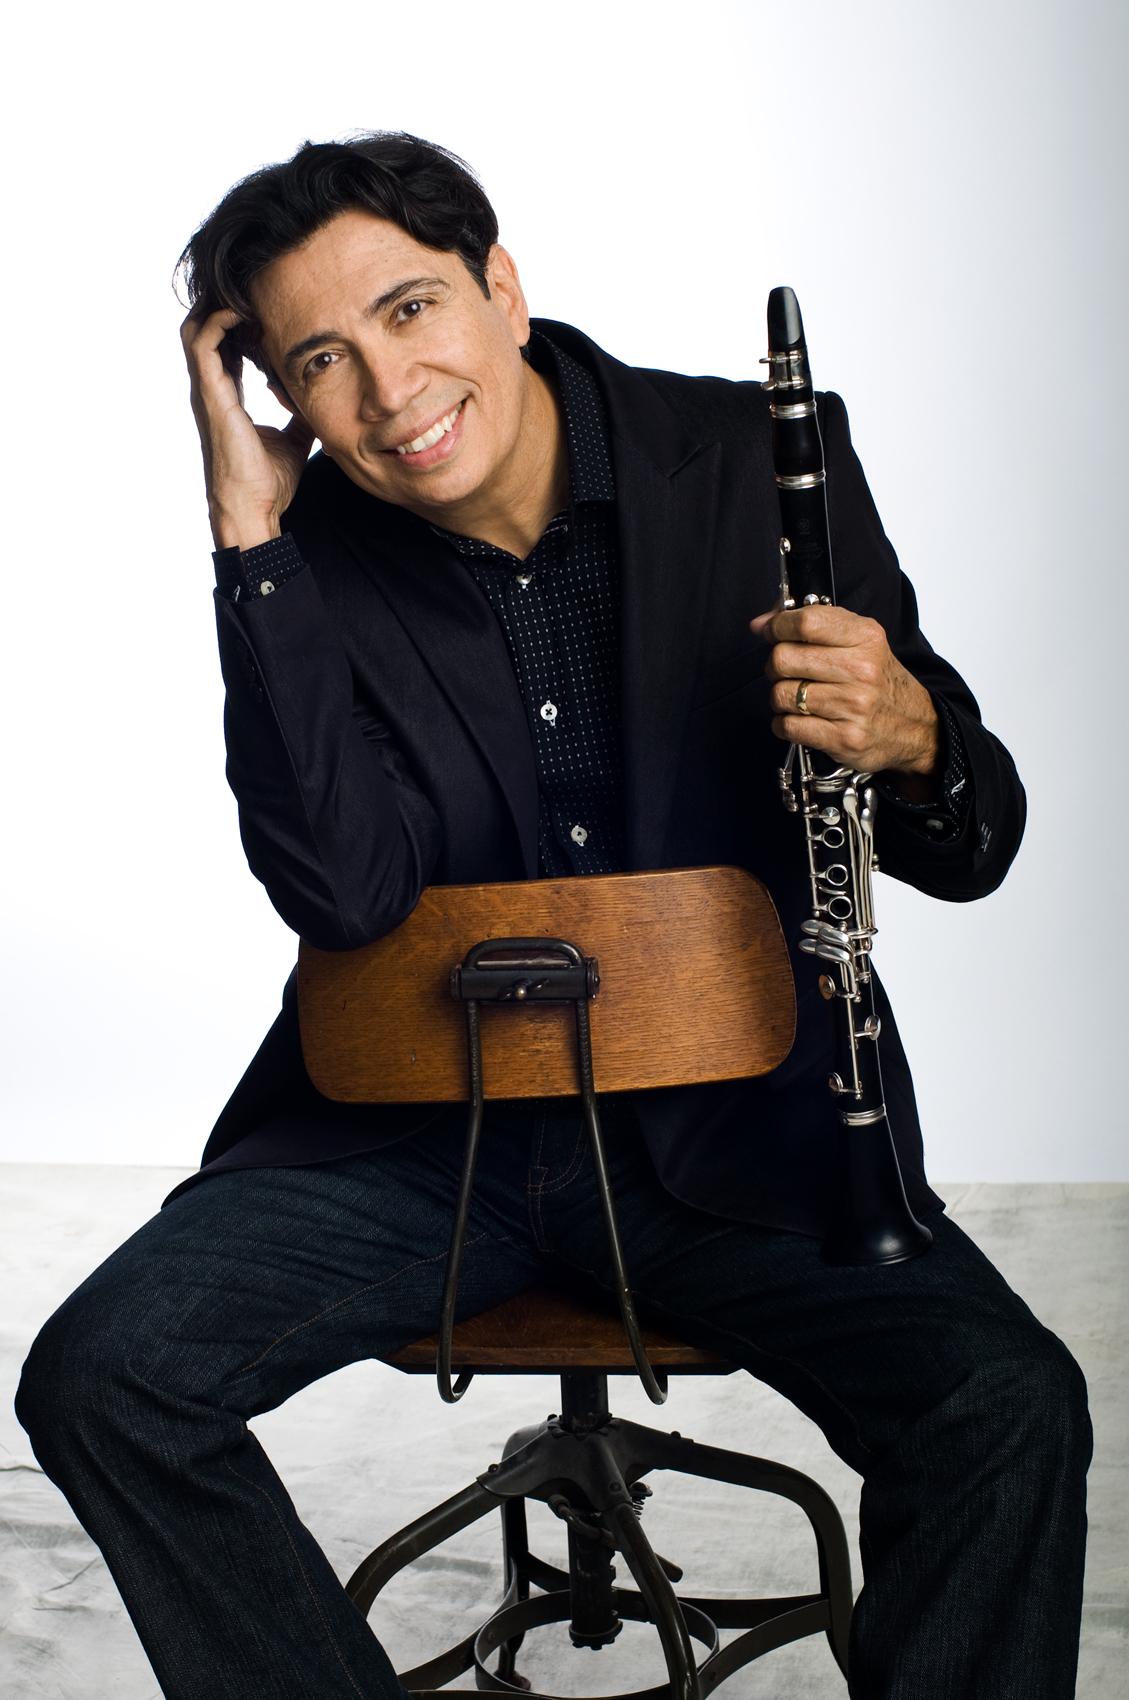 JoaquinValdepenas